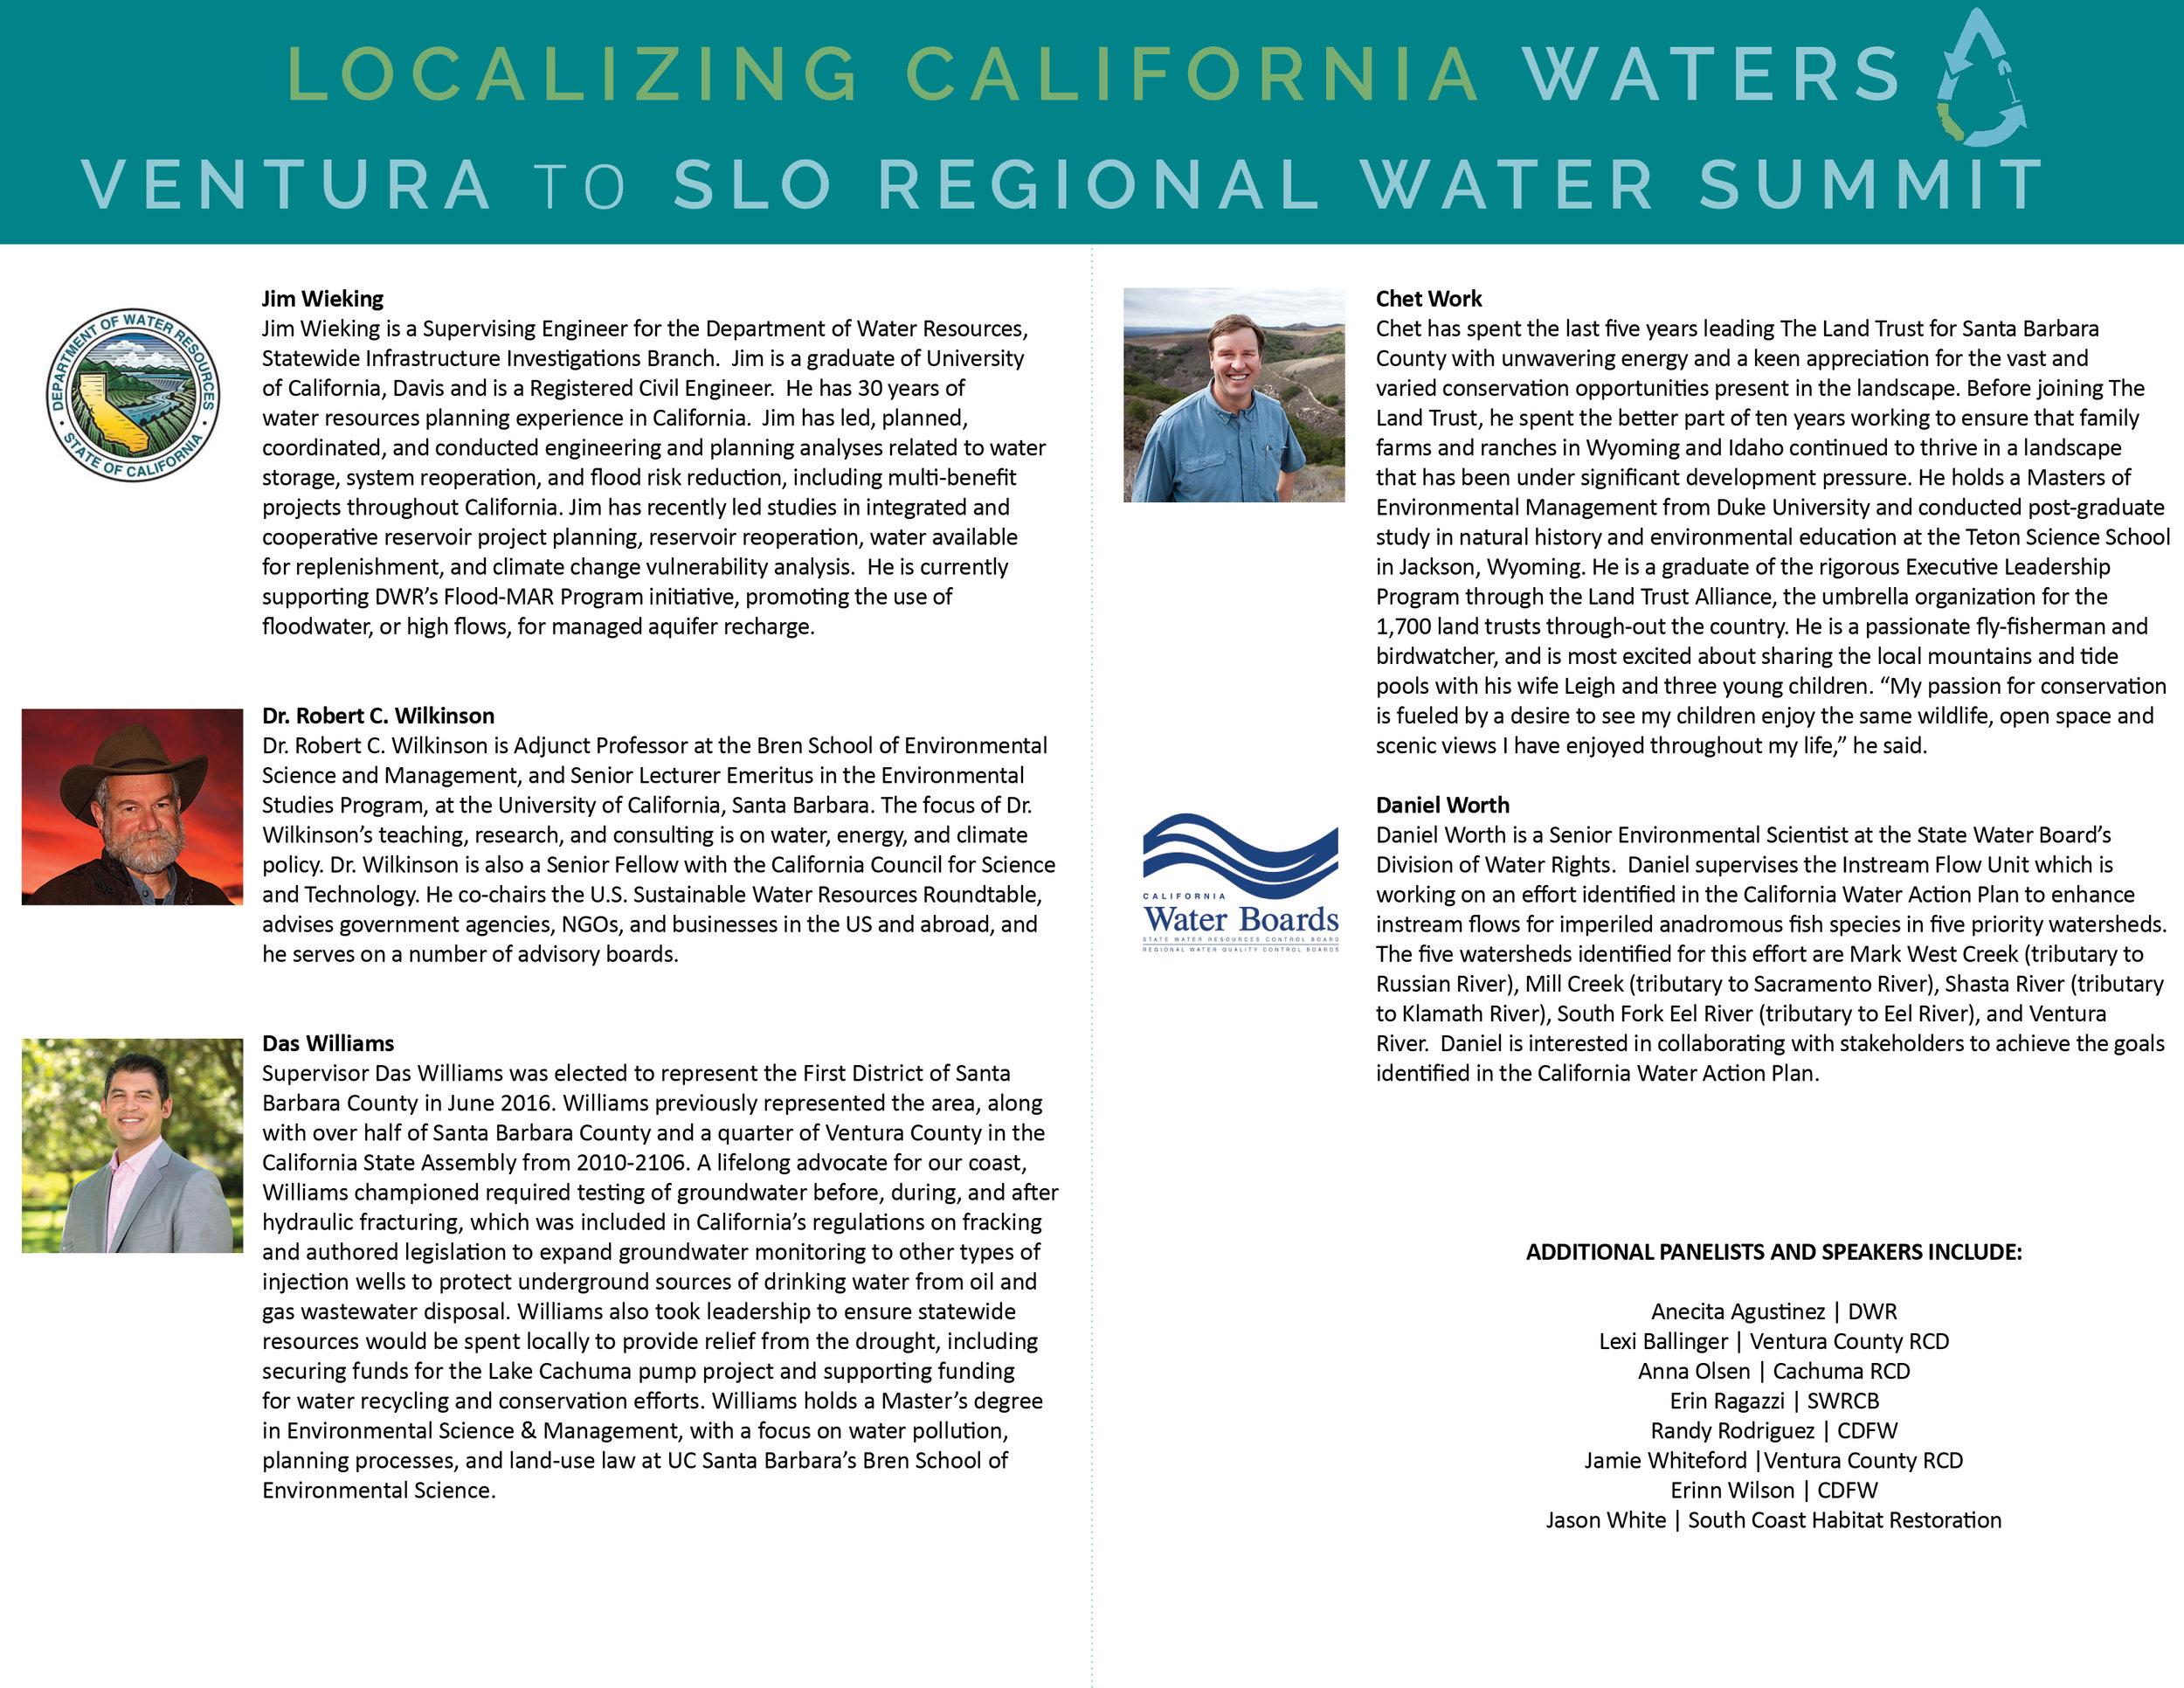 LCW Ventura_SLO_ 2019_Program_1904268.jpg